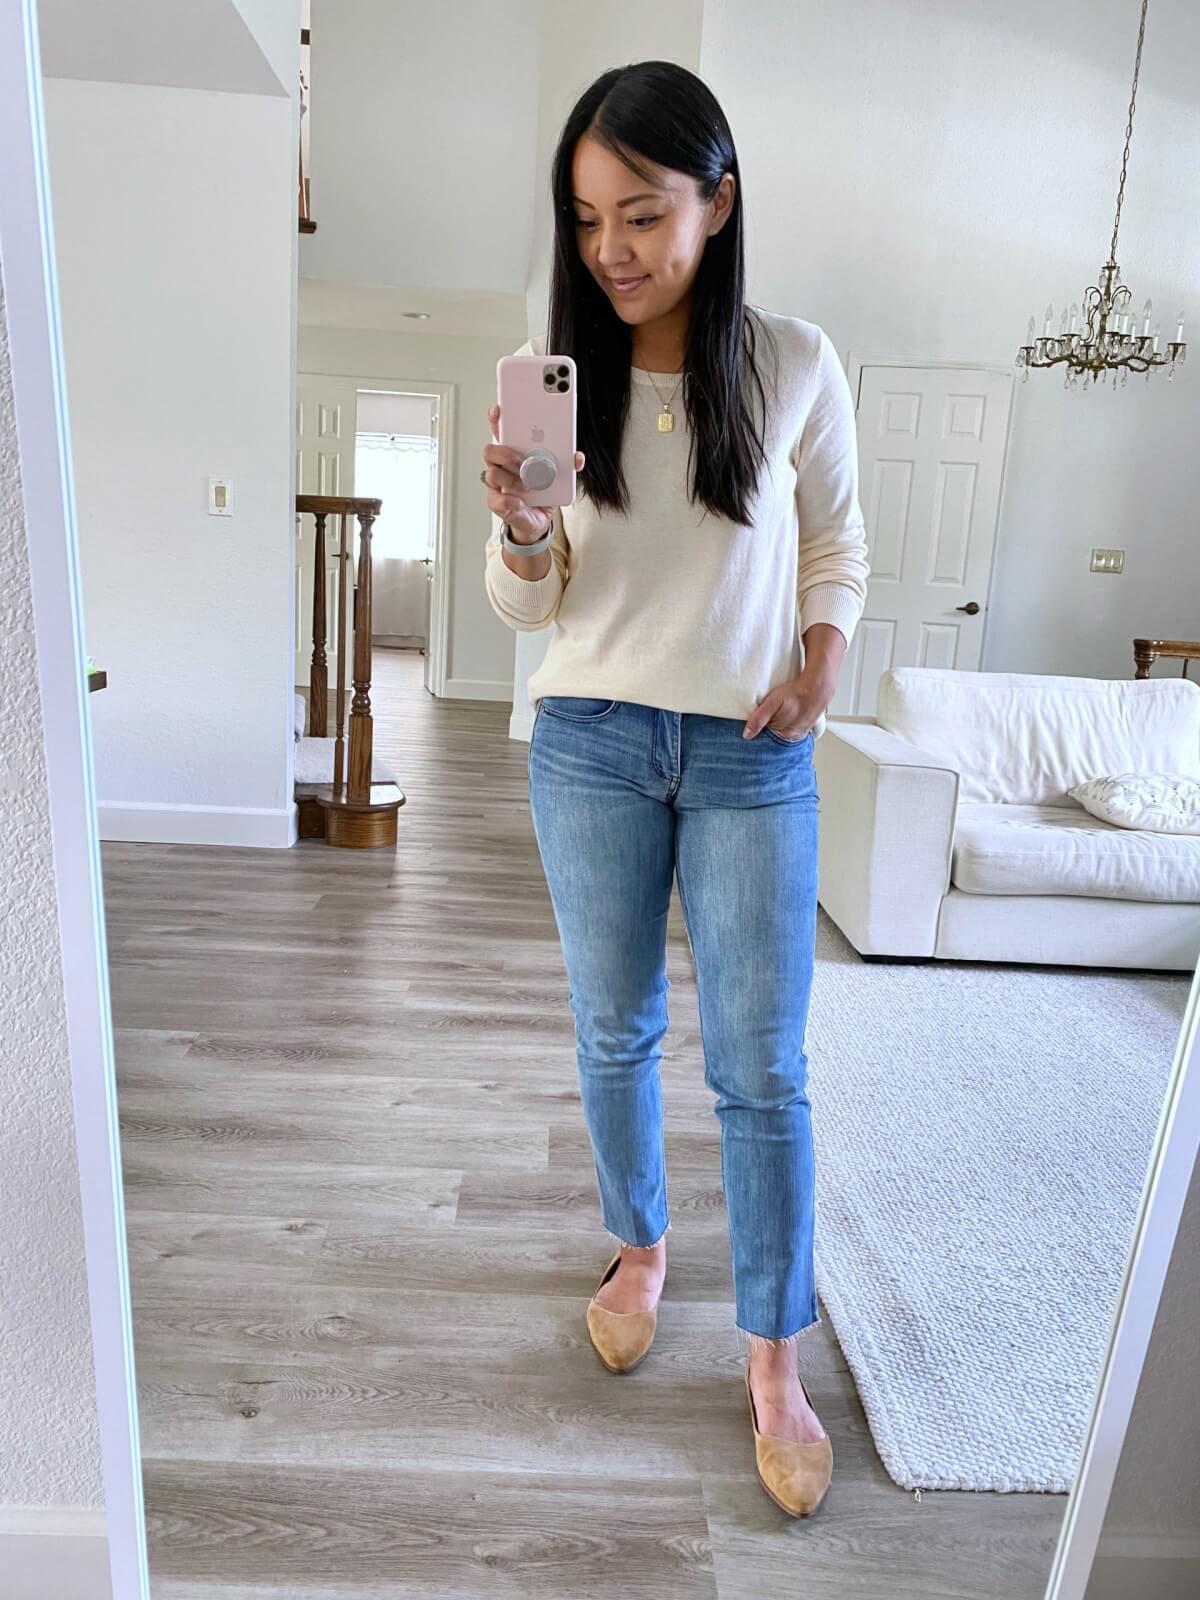 Nicer Casual Outfit: Amazon cream crewneck sweater + light blue straight leg denim + tan suede flats + gold pendant necklace